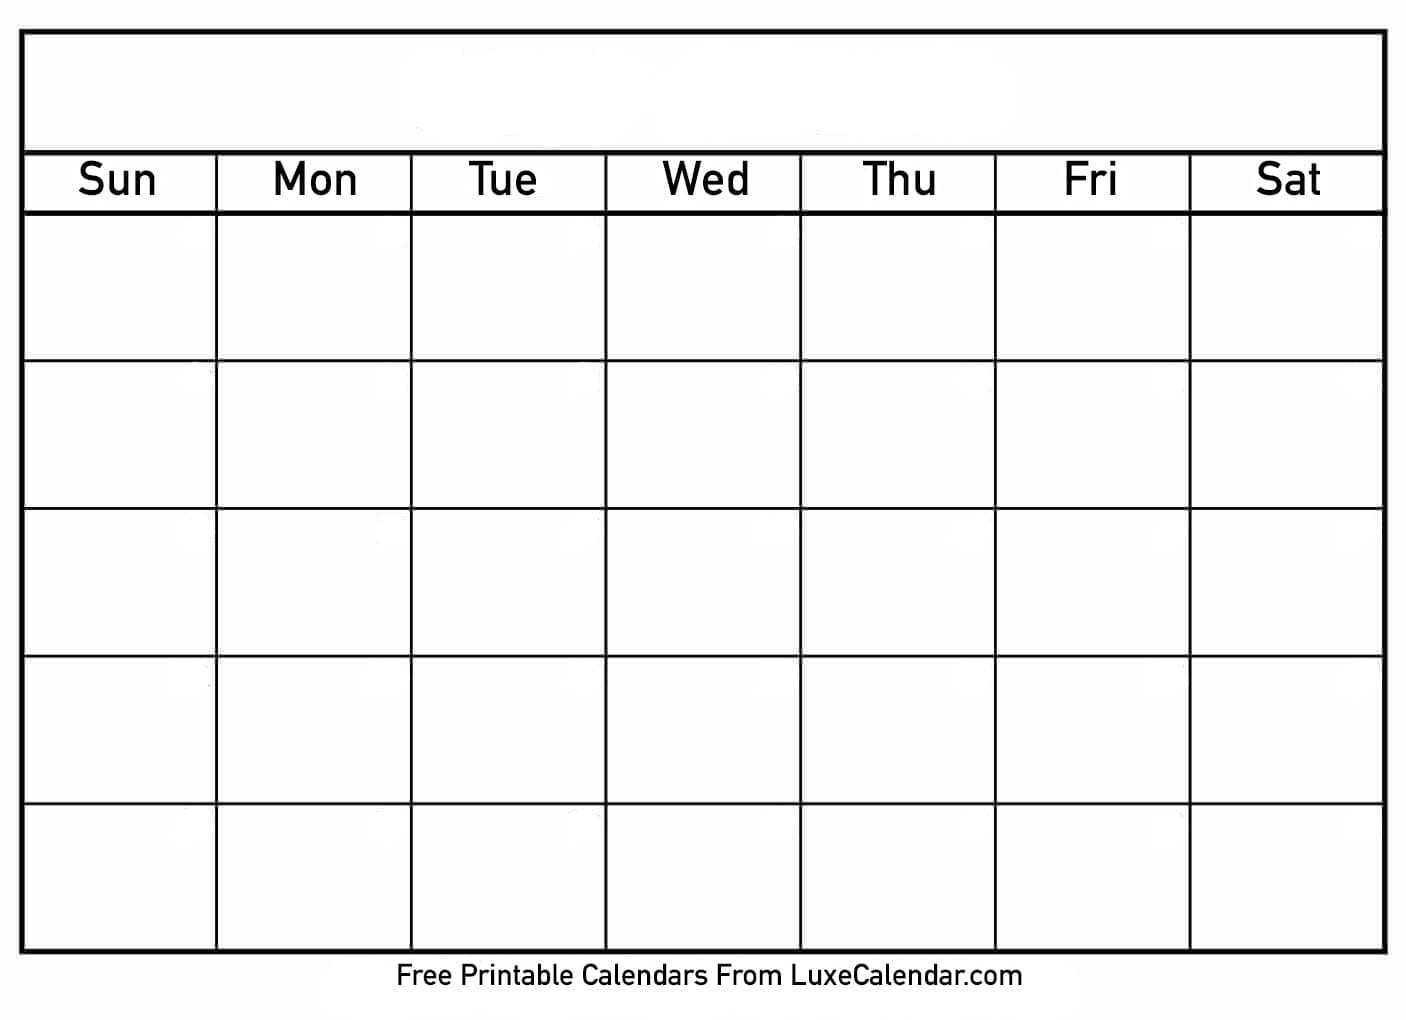 Printable Calendar Templates Full Page - Calendar Throughout Full Page Blank Calendar Template